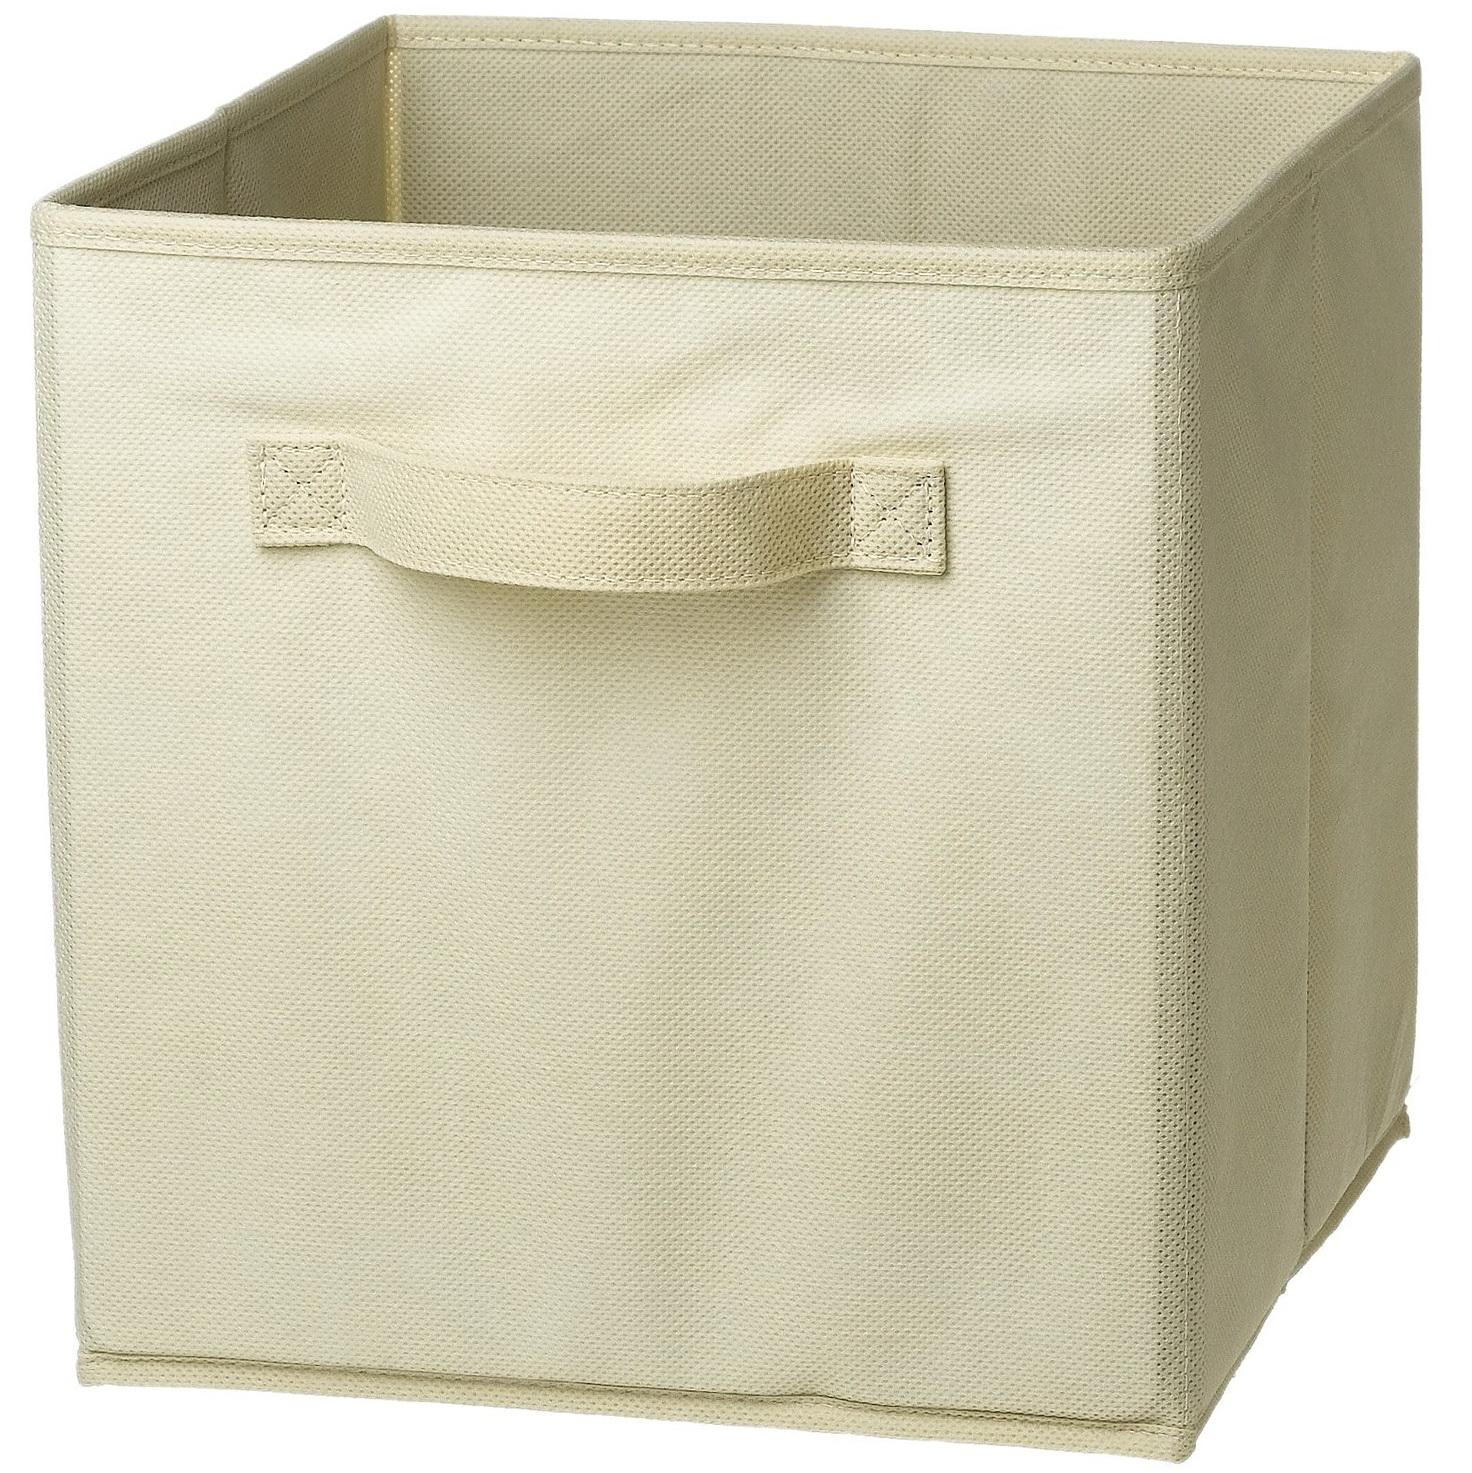 Good Closetmaid Drawer Storage